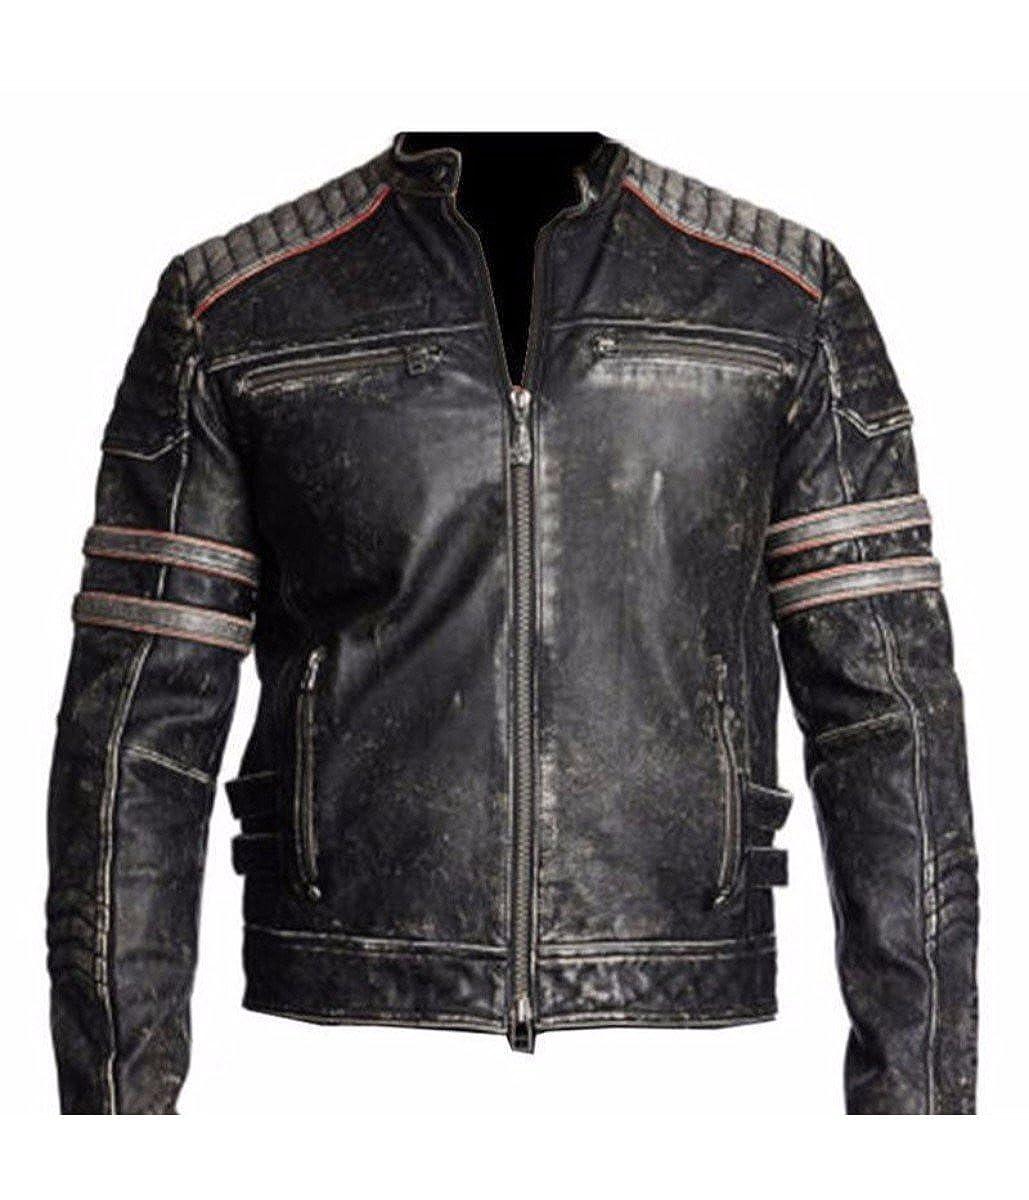 Feather Skin Men's Biker Vintage Motorcycle Distressed Black Retro Leather Jacket us-vin-dist-blk-l-p